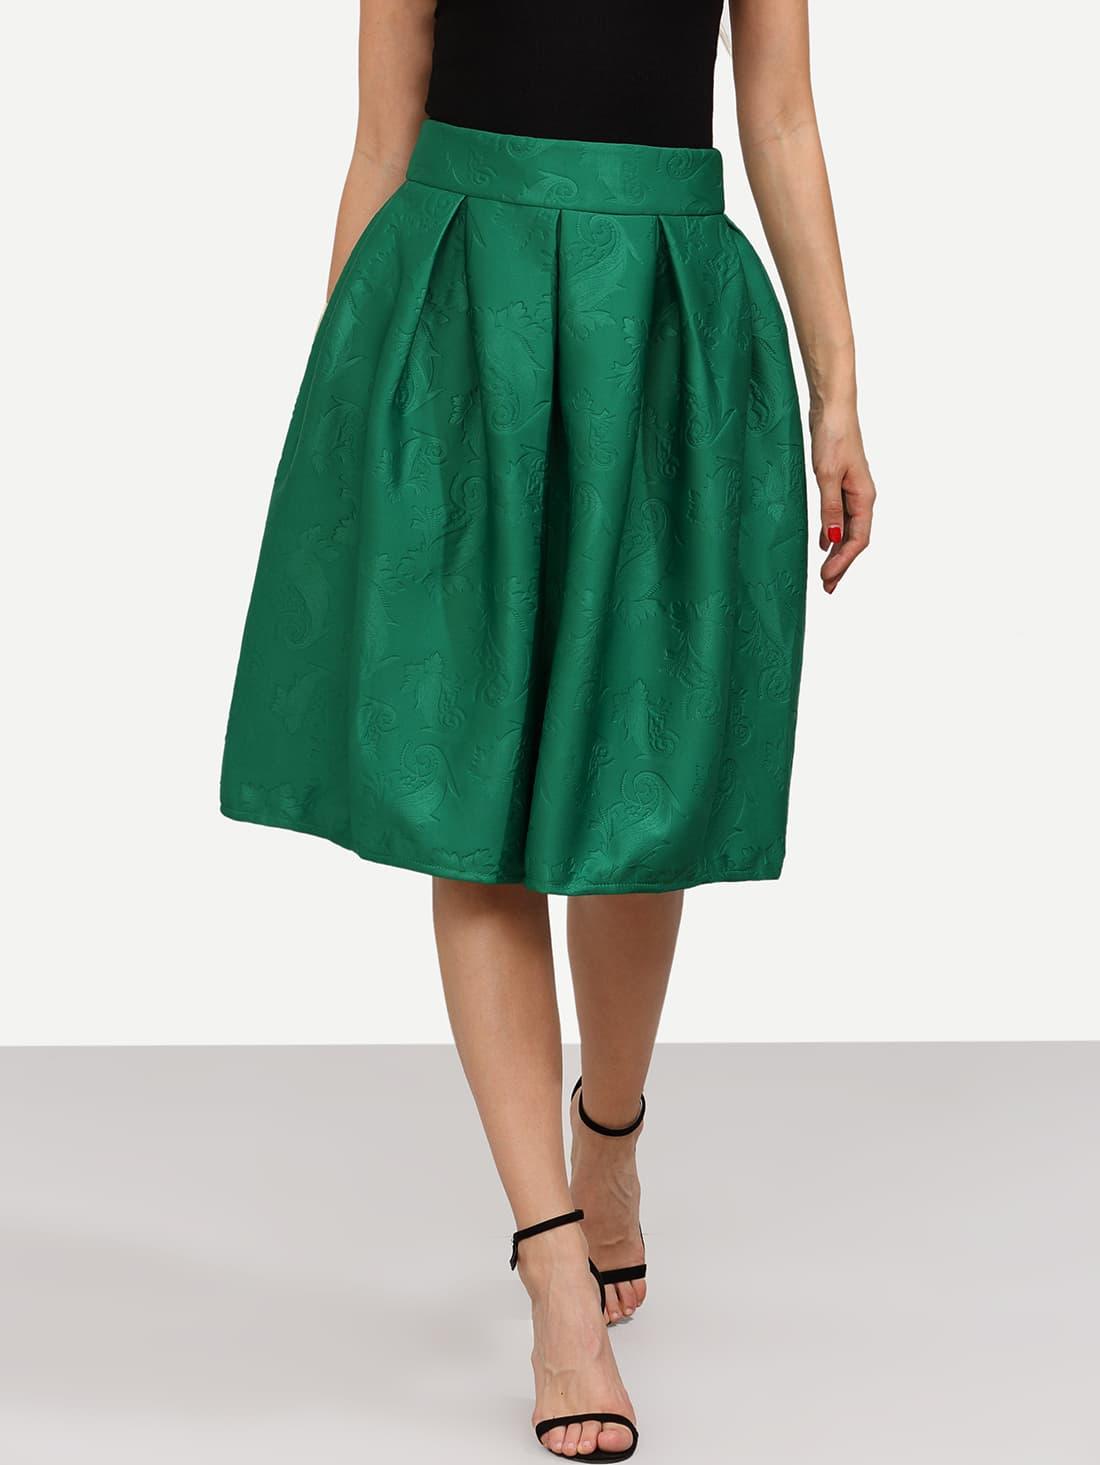 Green Jacquard Flare Midi Skirt -SheIn(Sheinside)